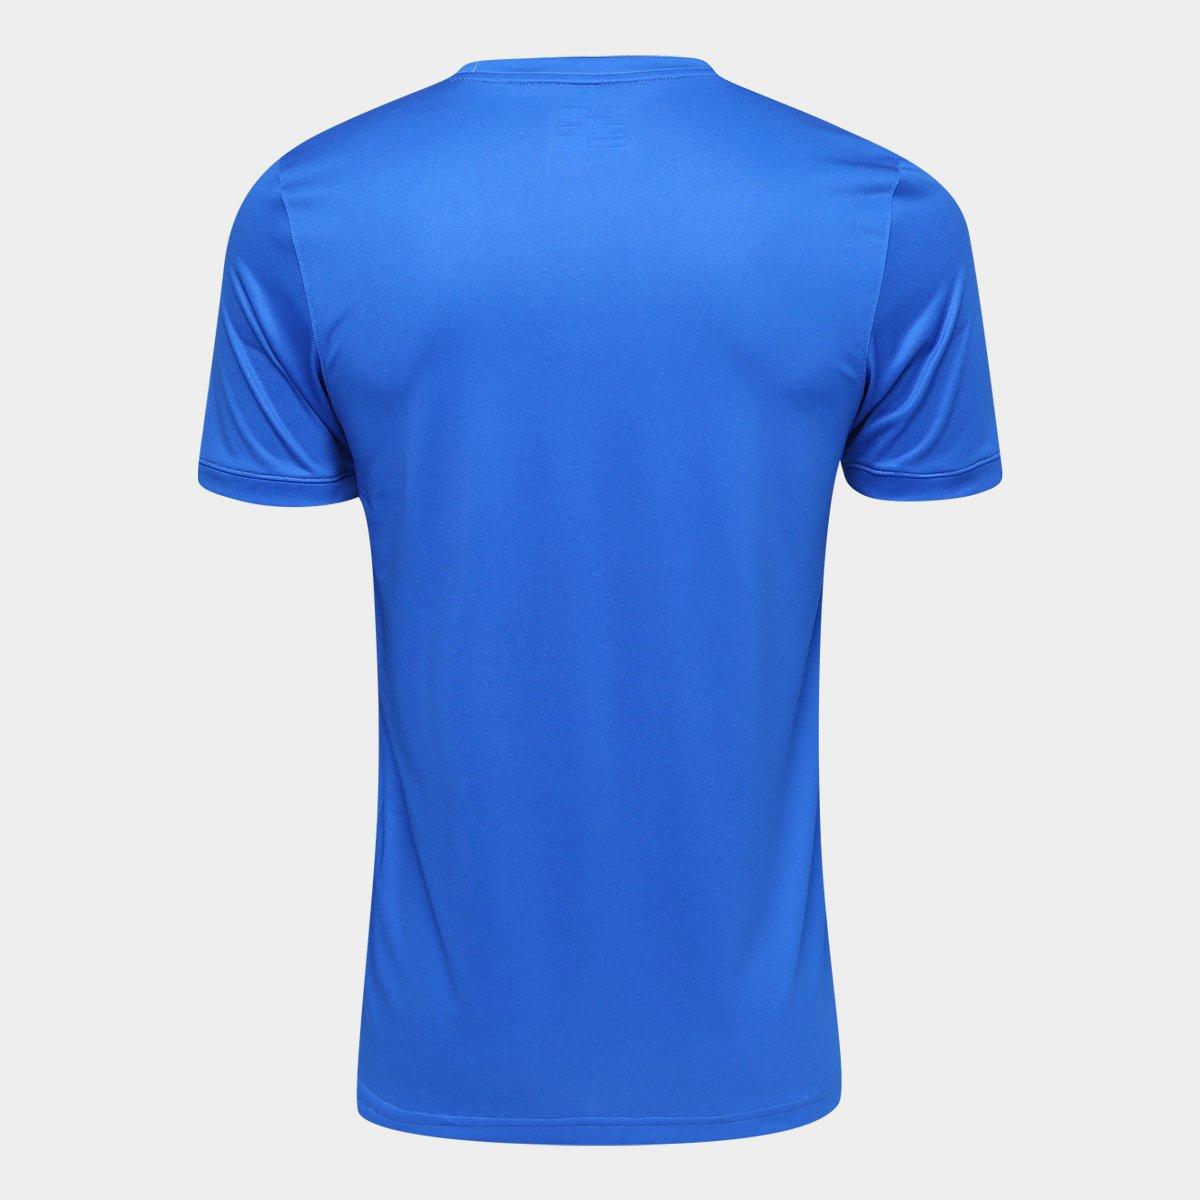 83808b8e64 ... Camisa Fluminense I 17 18 s nº Torcedor Under Armour Masculina ...